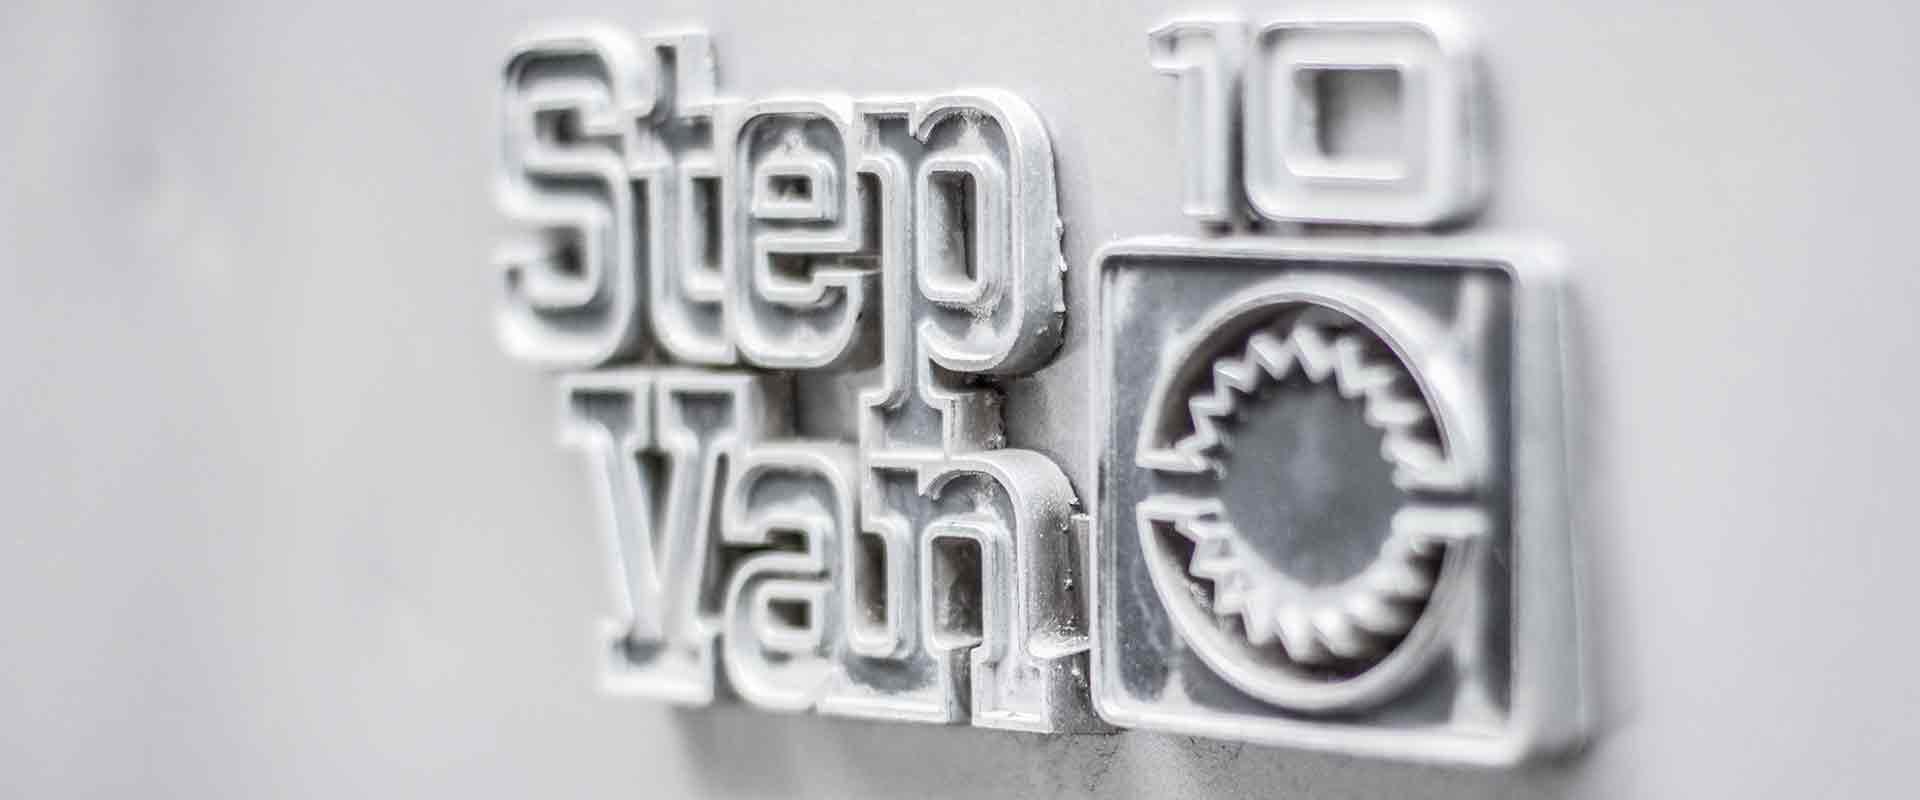 Chevrolet Step-Van Logo